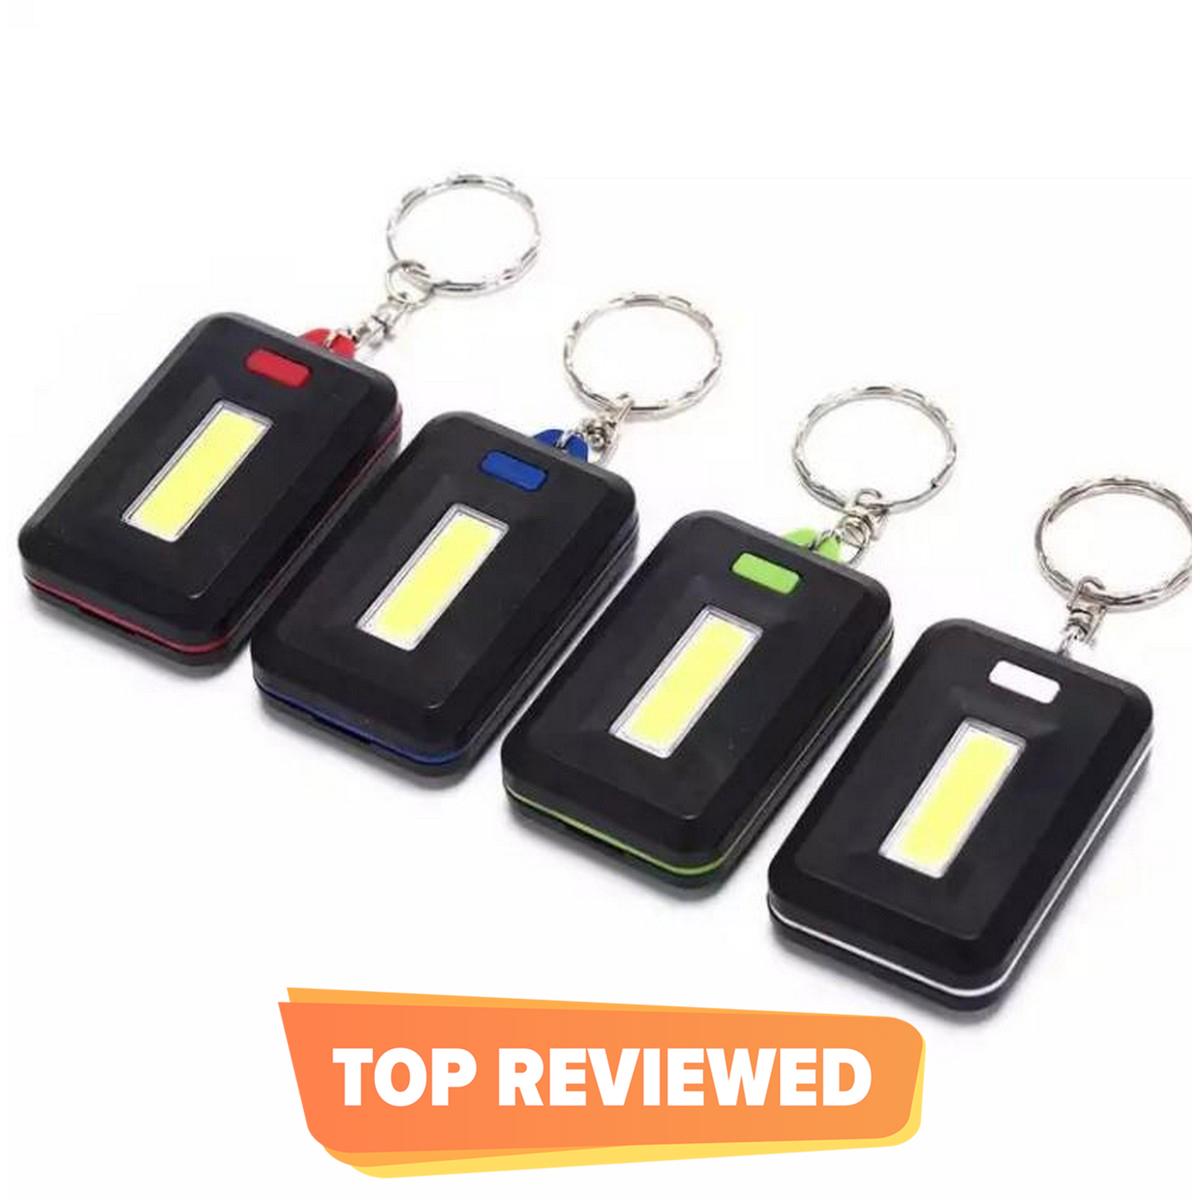 COB Mini Keychain Keyring Flashlight 3-Mode Waterproof Portable Torch Light Lamp White Led Light